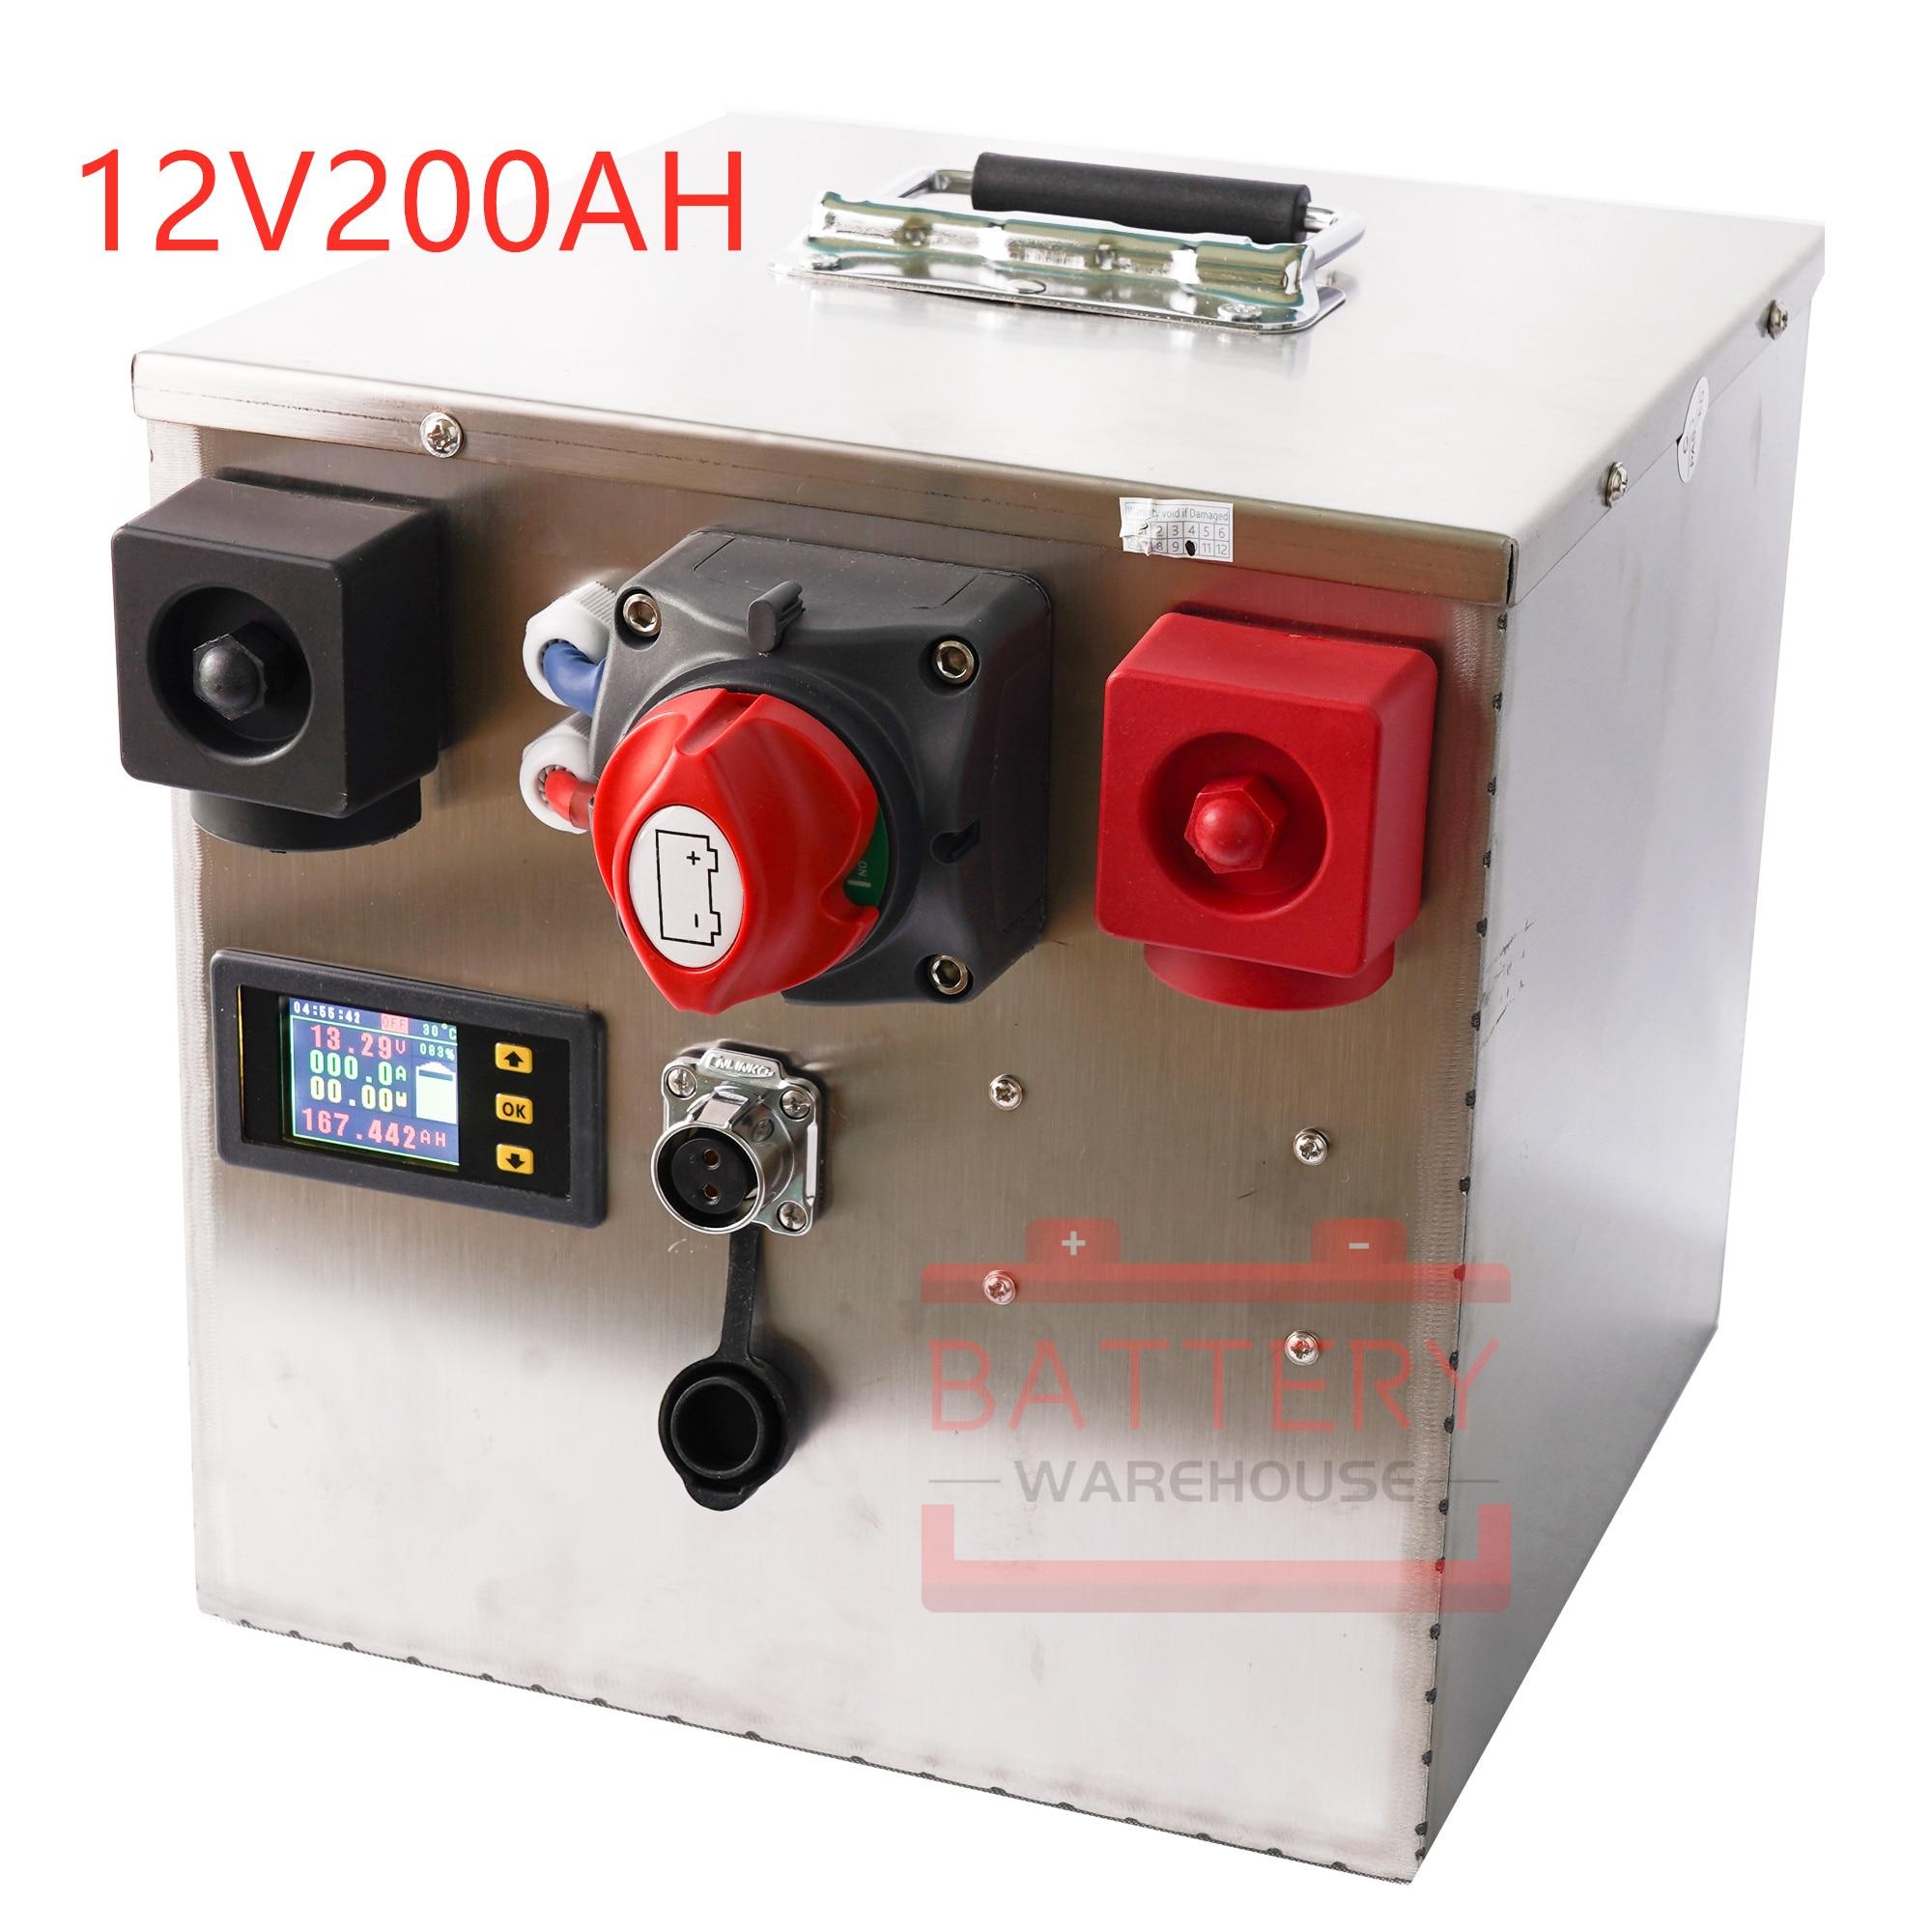 12V200AH with BMS lifepo4 lithium iron li-ion battery for12.8v RV motor home/boat motors/inverter/solar panel/outdoor power bank